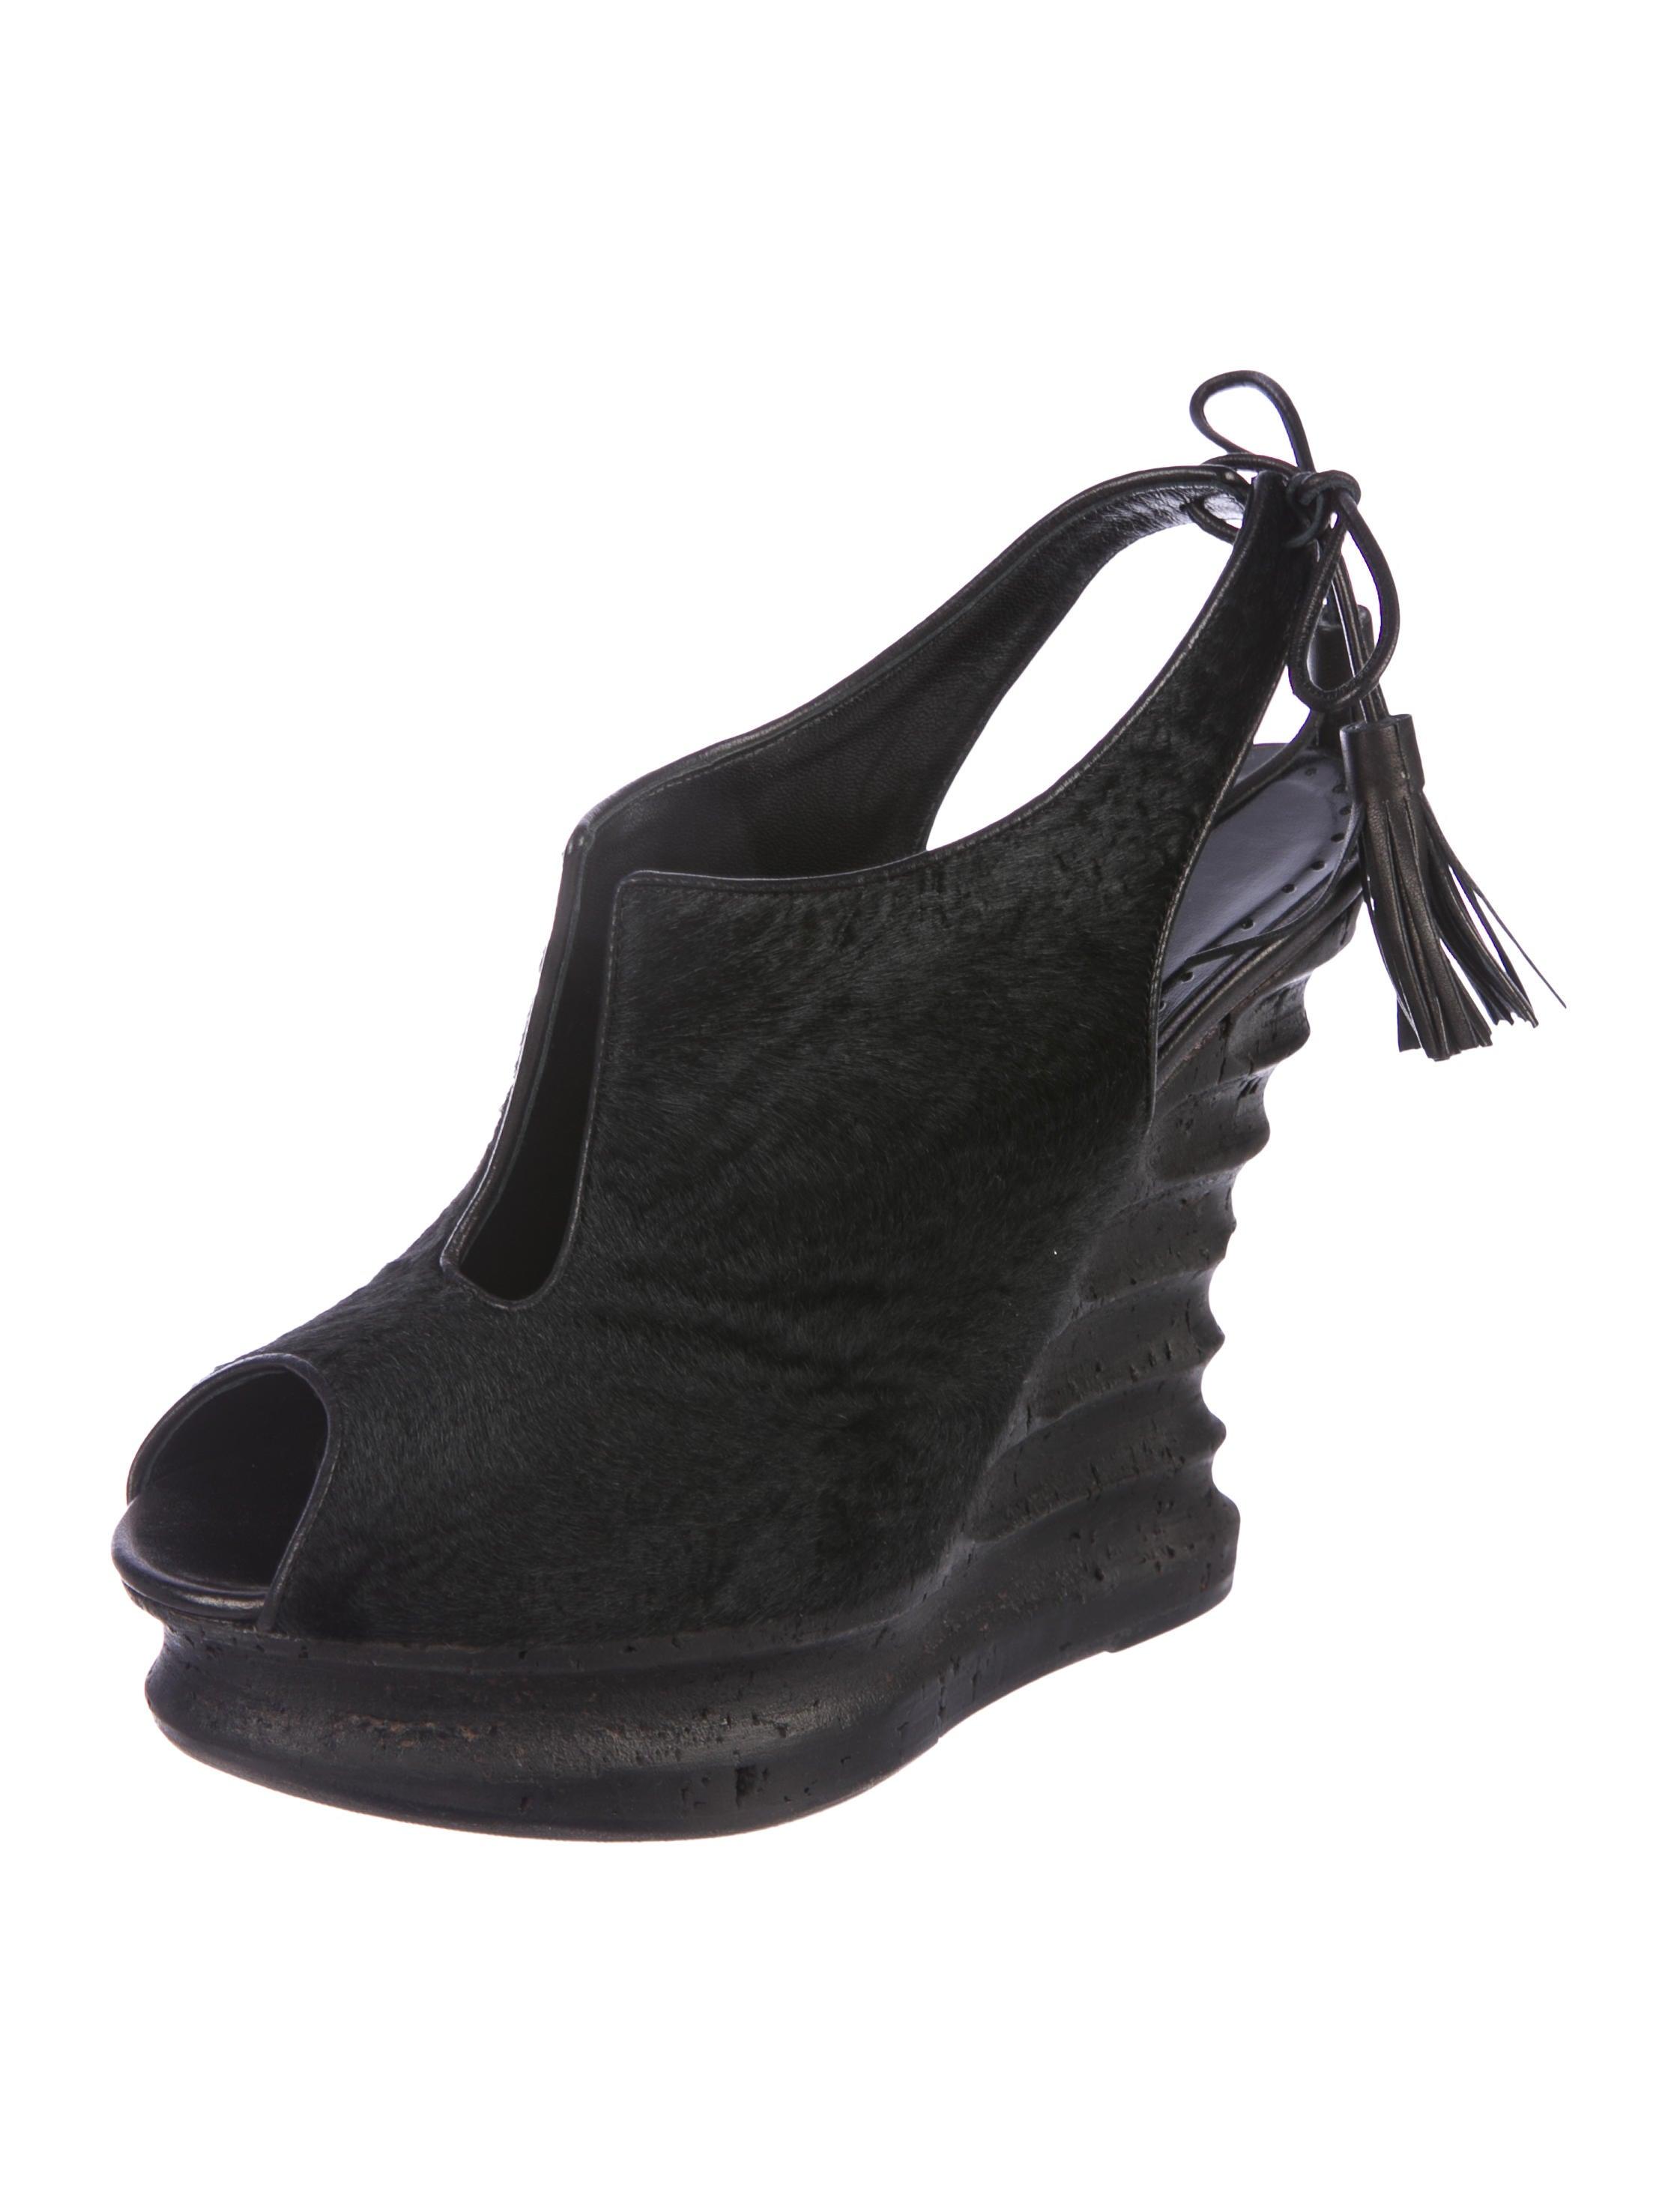 low price fee shipping Alexa Wagner Talita Wedge Sandals ebay online wide range of cheap geniue stockist ySSoJ